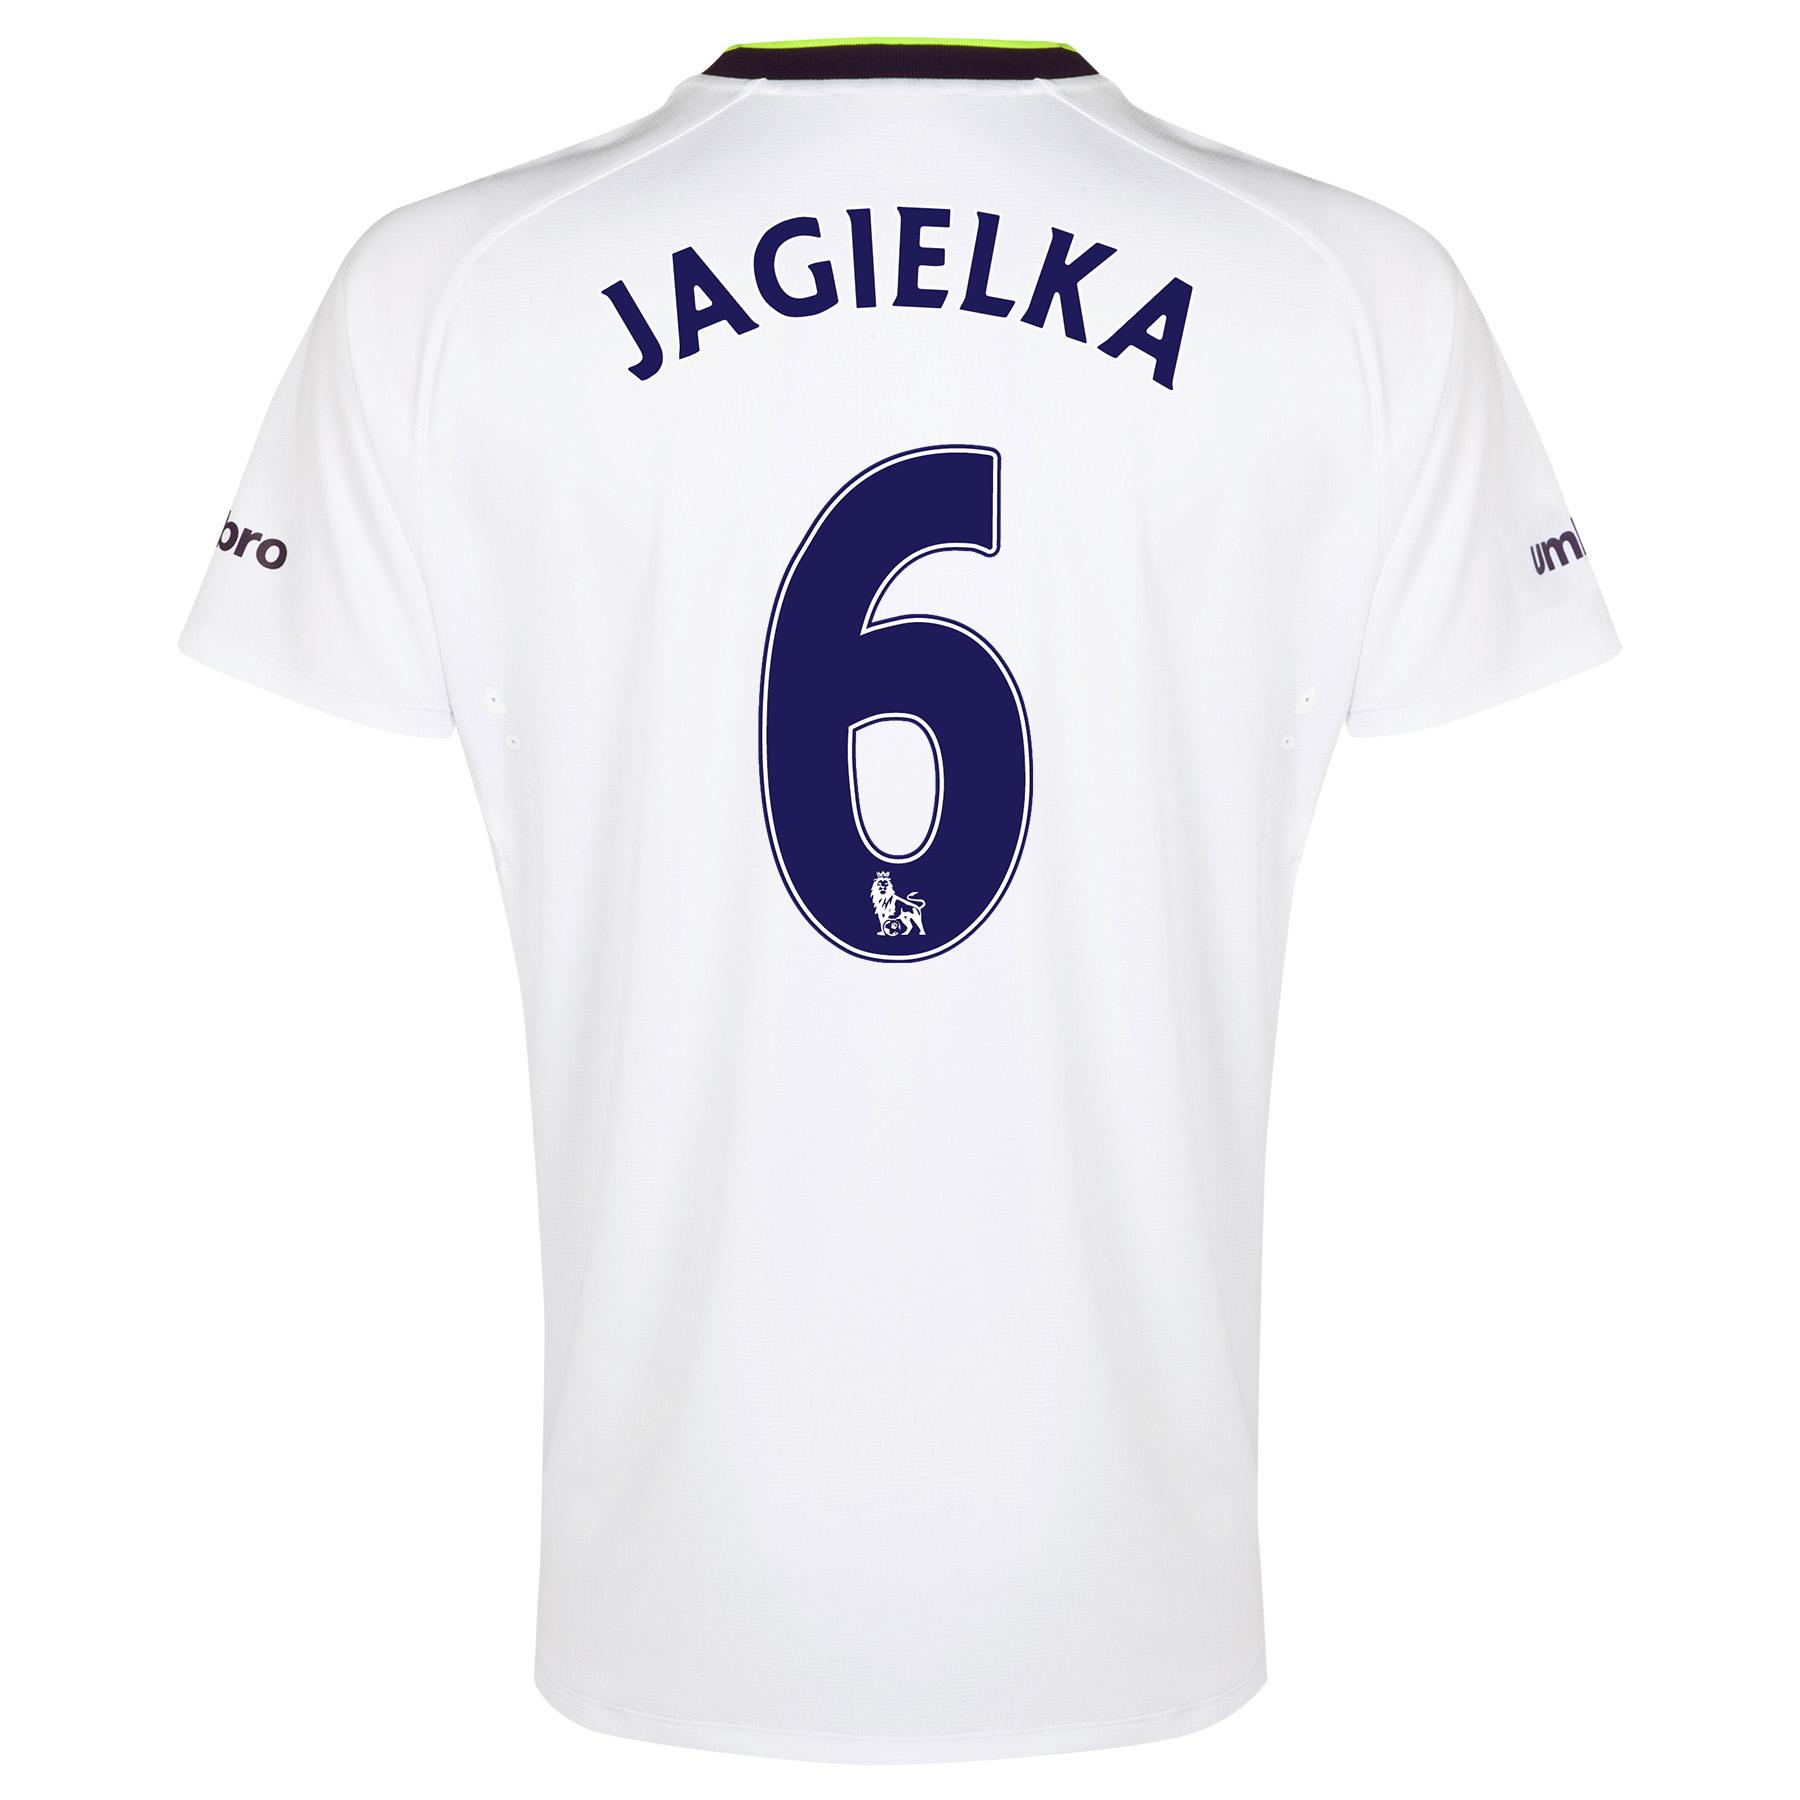 Everton SS 3rd Shirt  2014/15 with Jagielka 6 printing